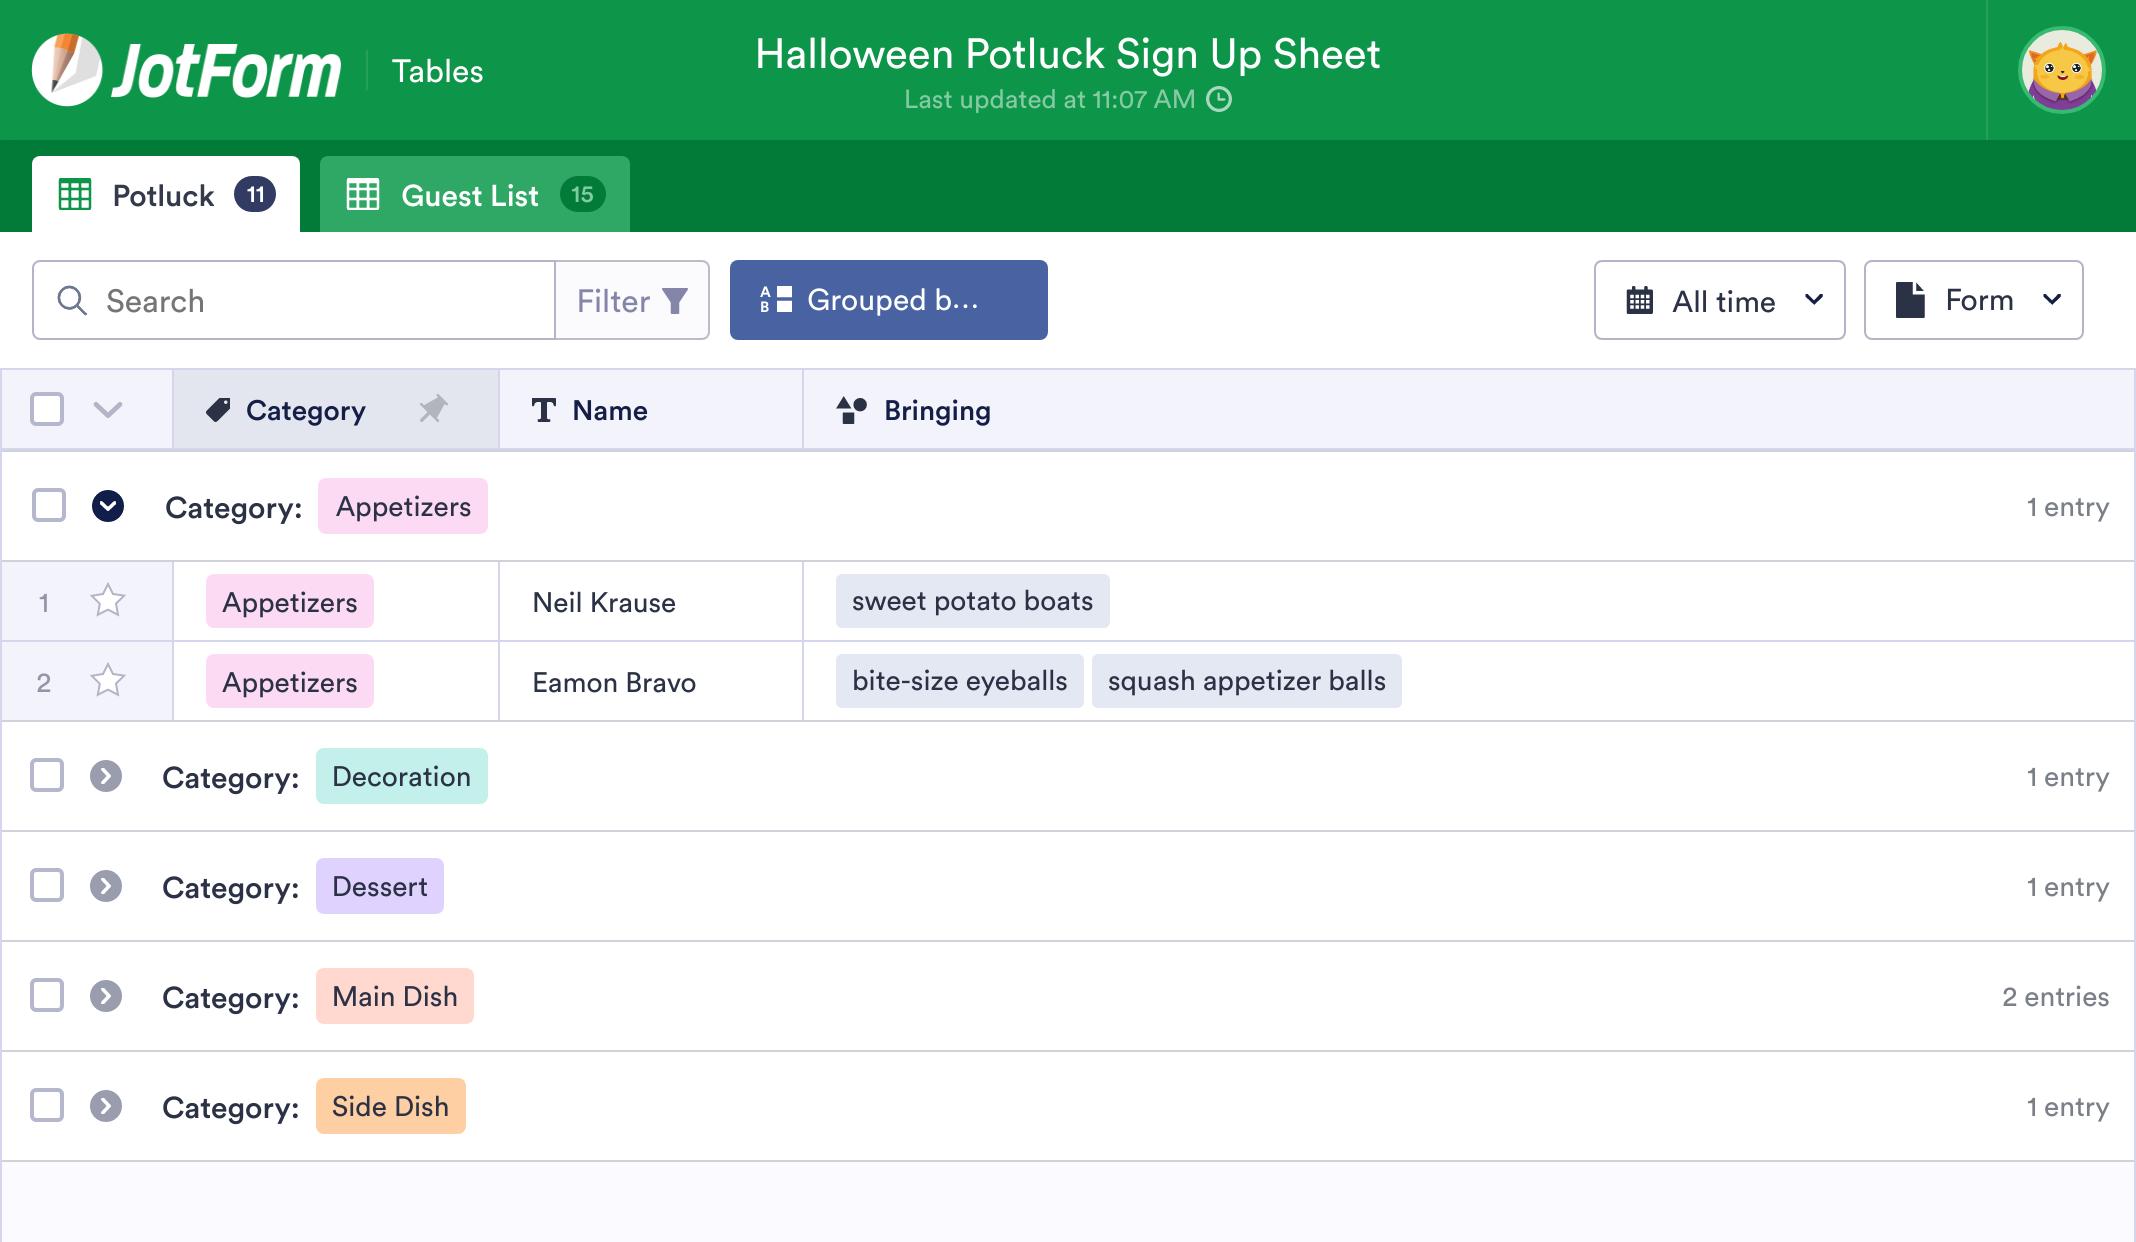 Halloween Potluck Sign Up Sheet